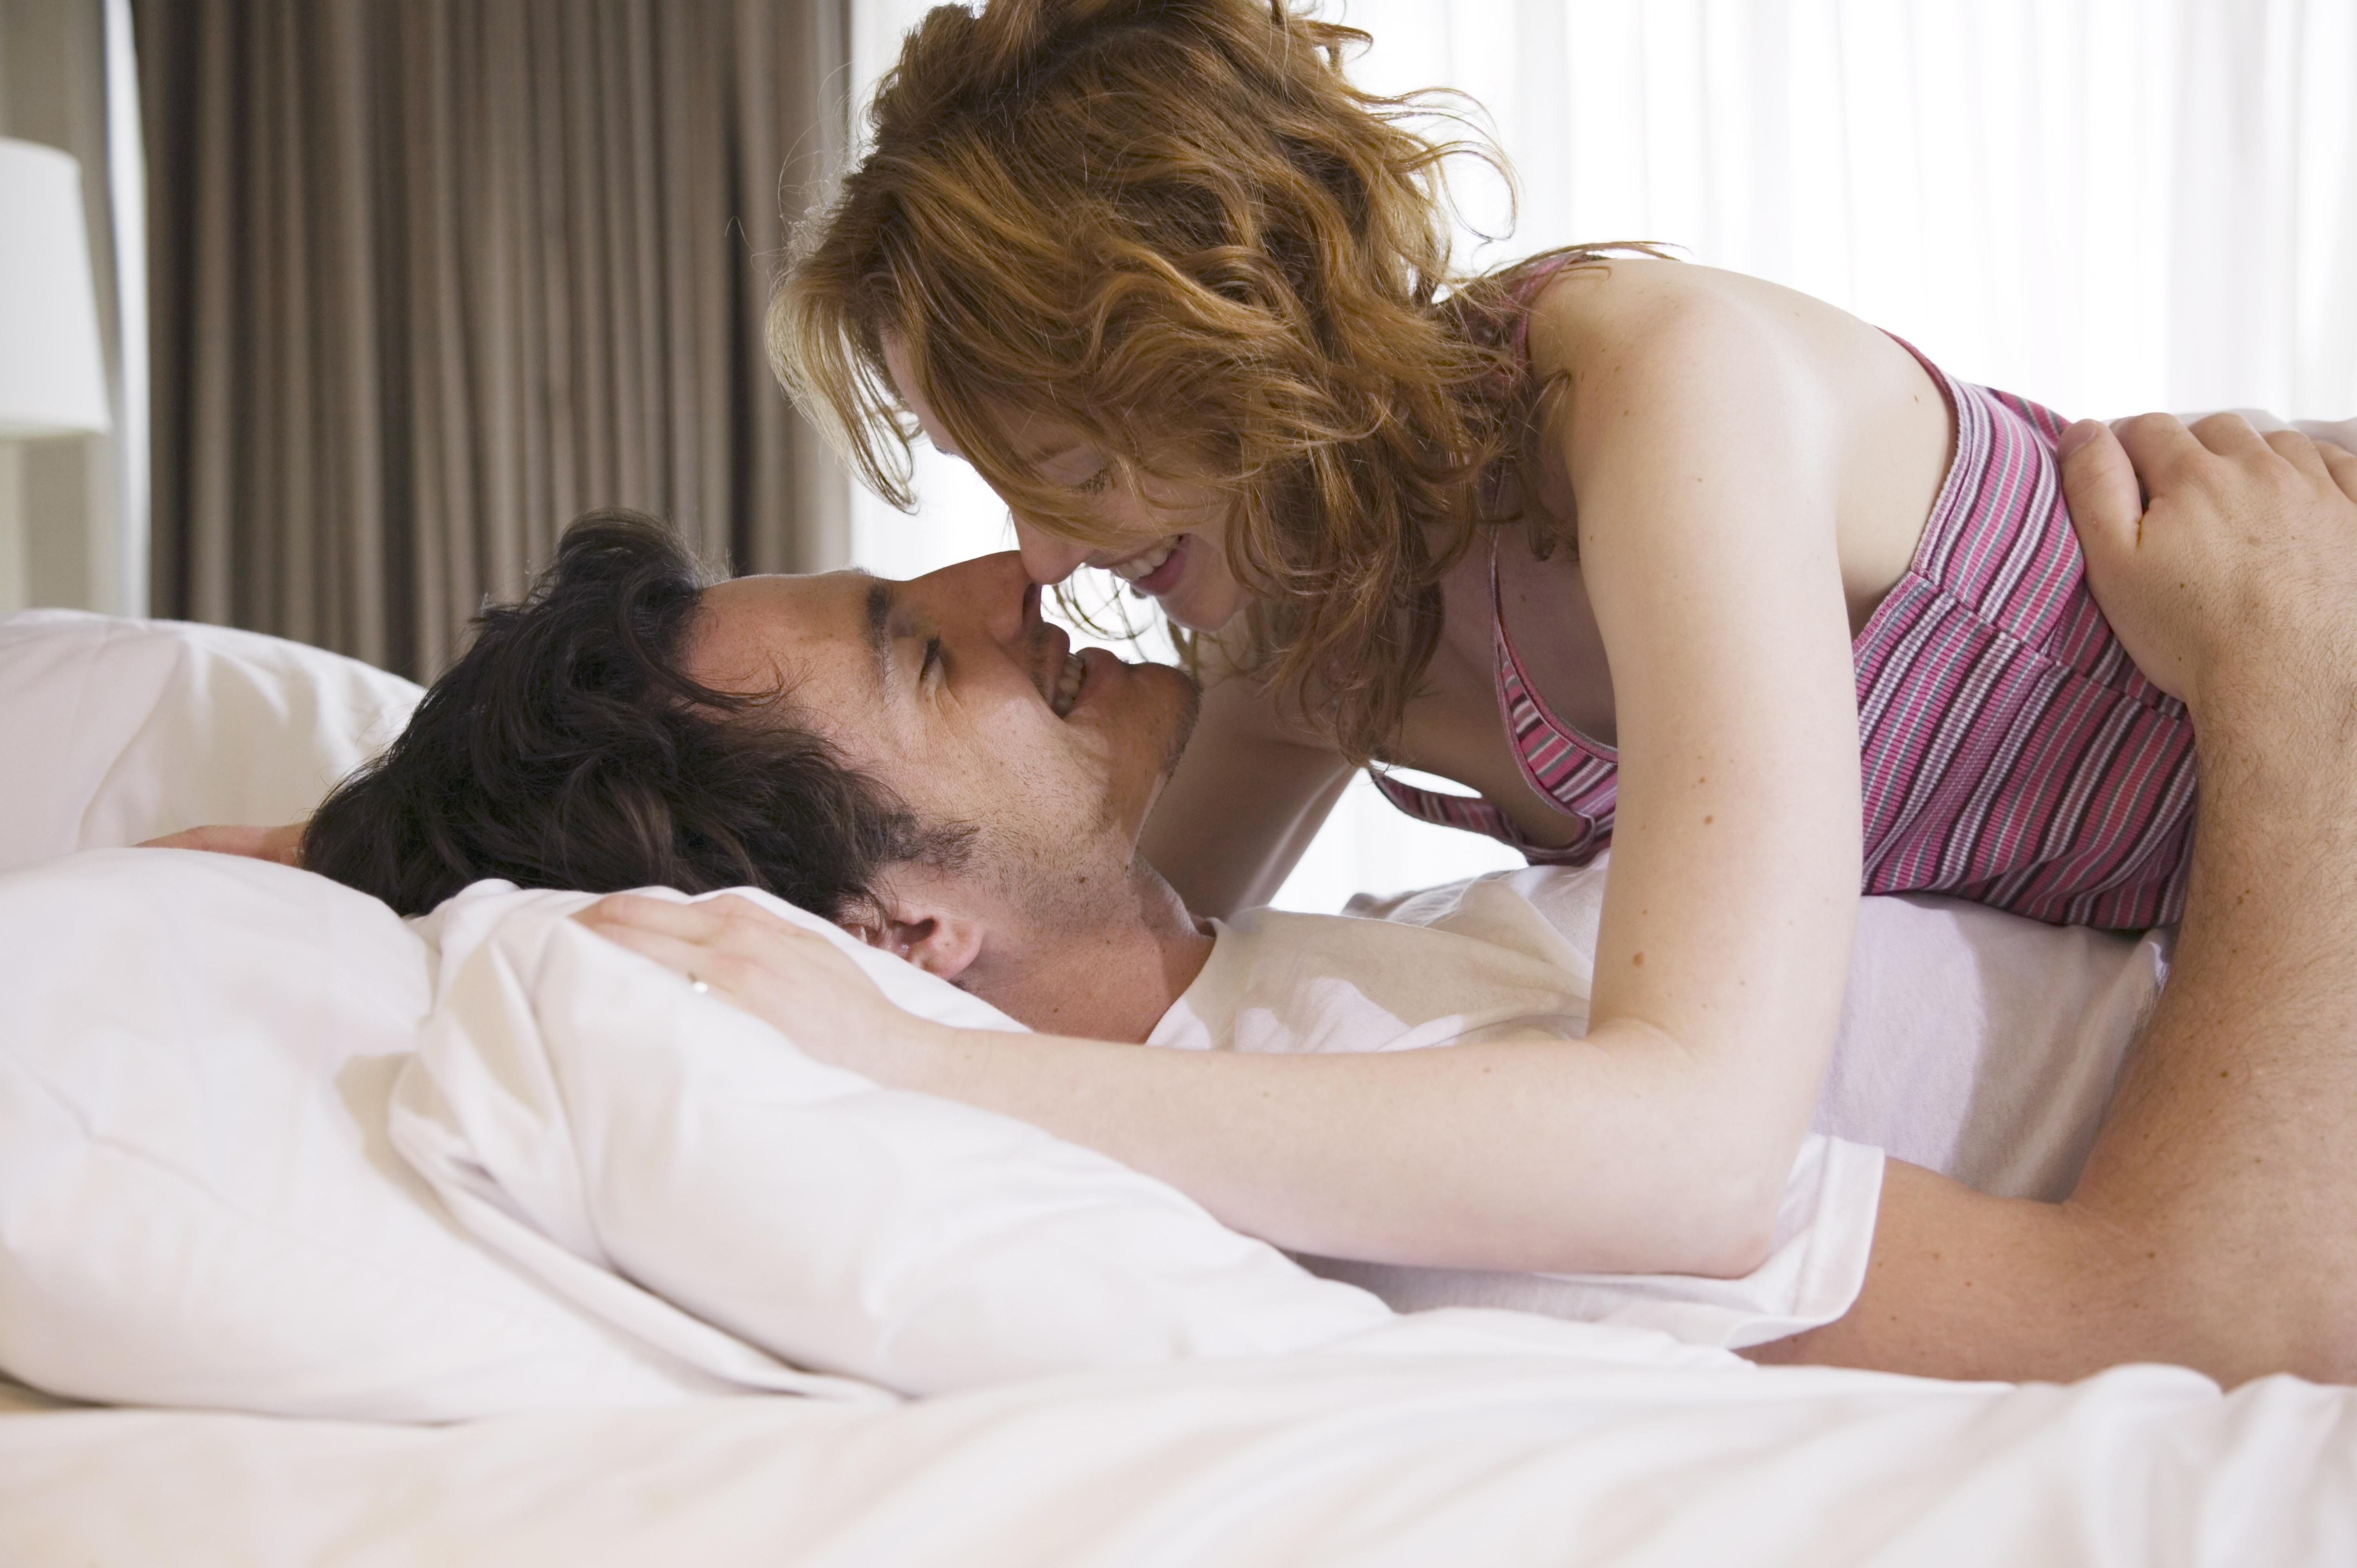 Pregnant couples having sex healthy!